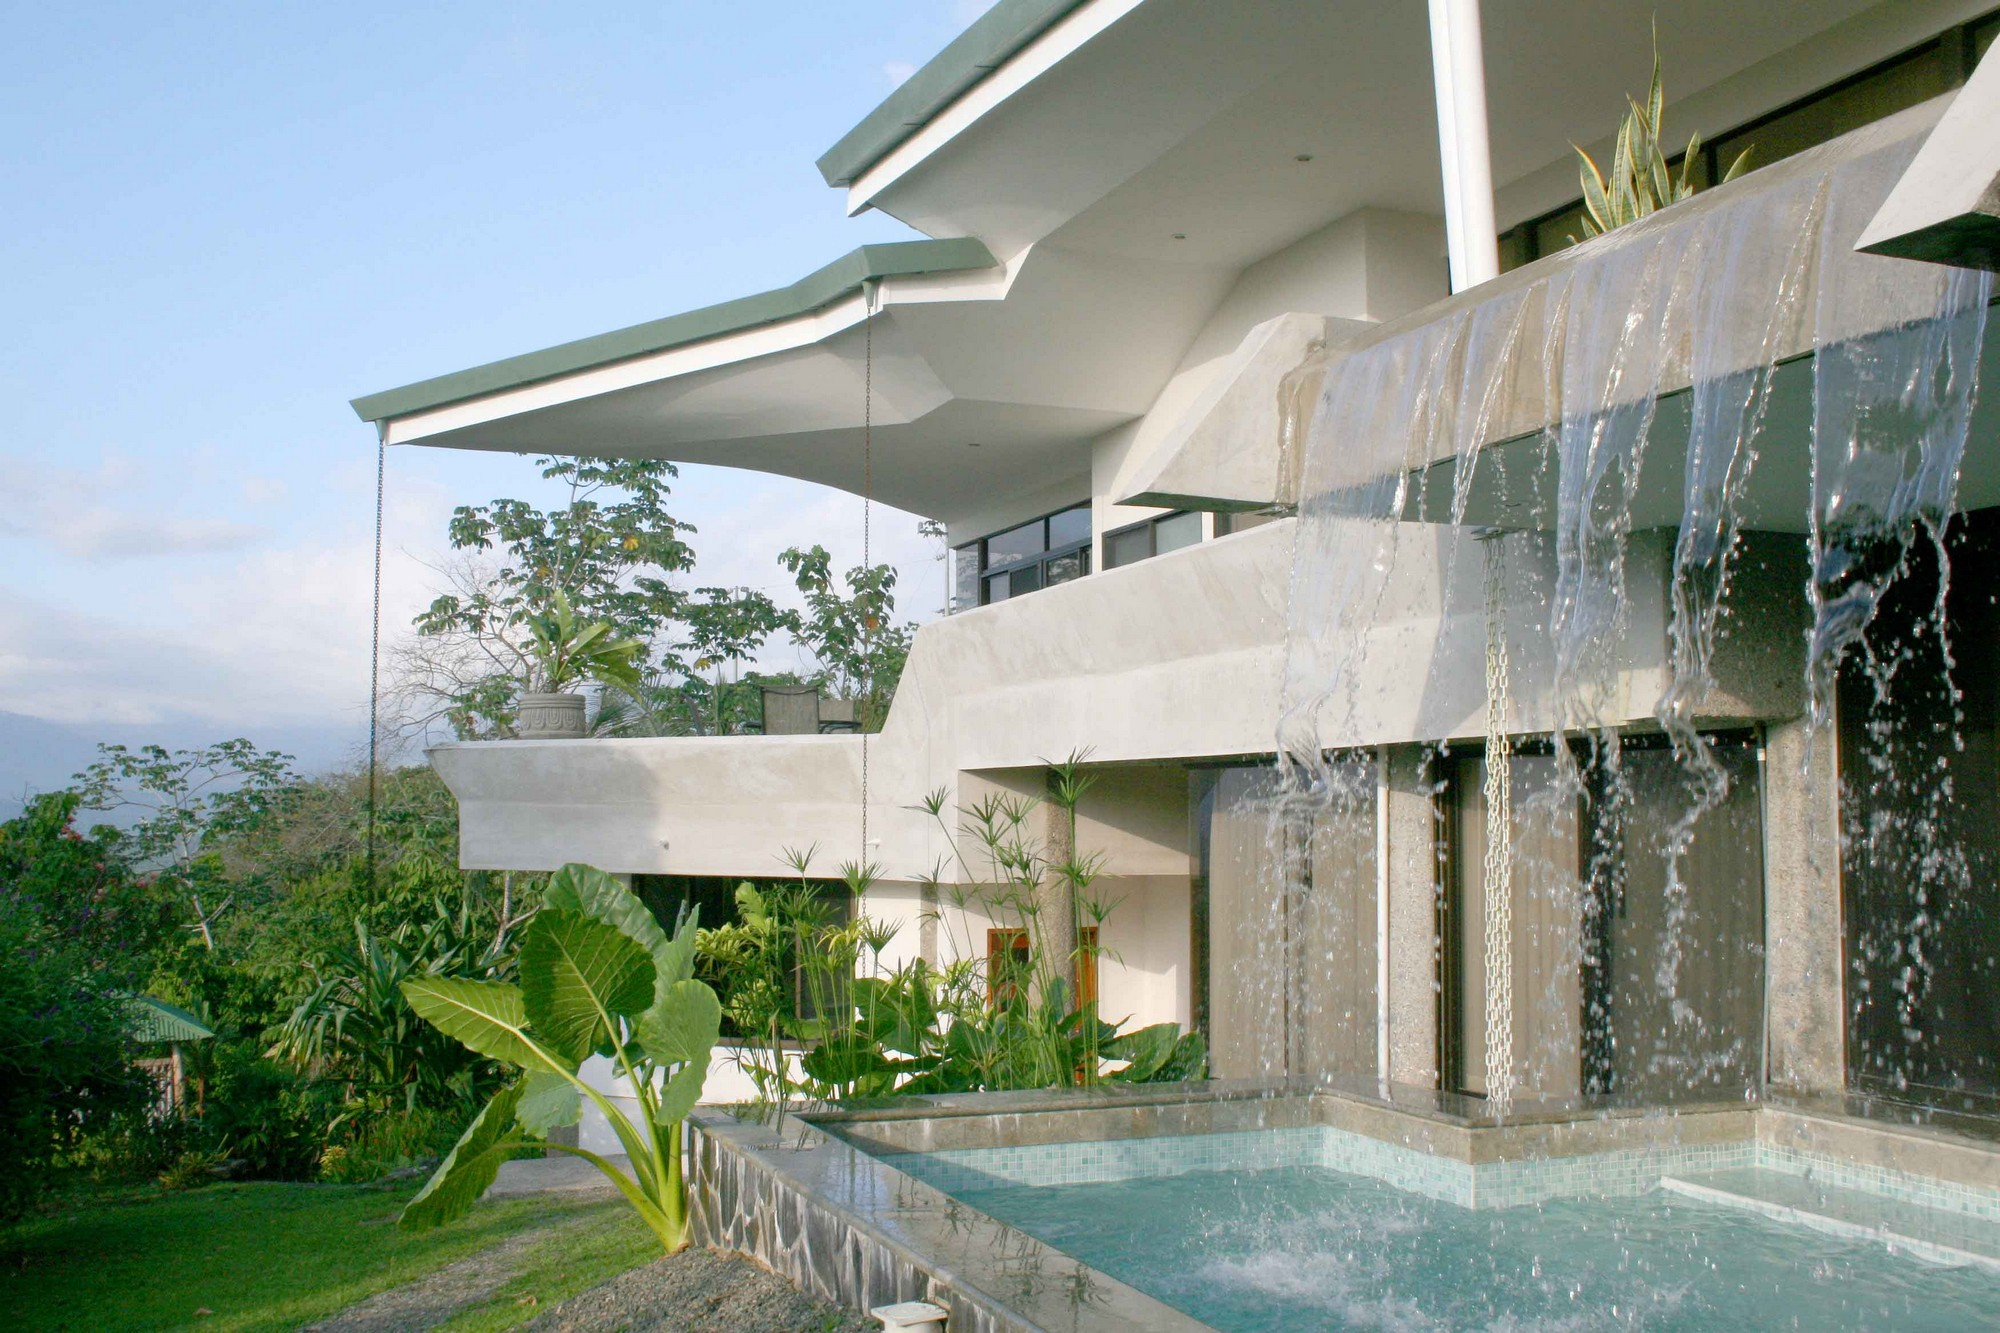 Casa de las Cascadas, Manuel Antonio, Costa Rica The waterfall feeds into the lower splash pool.